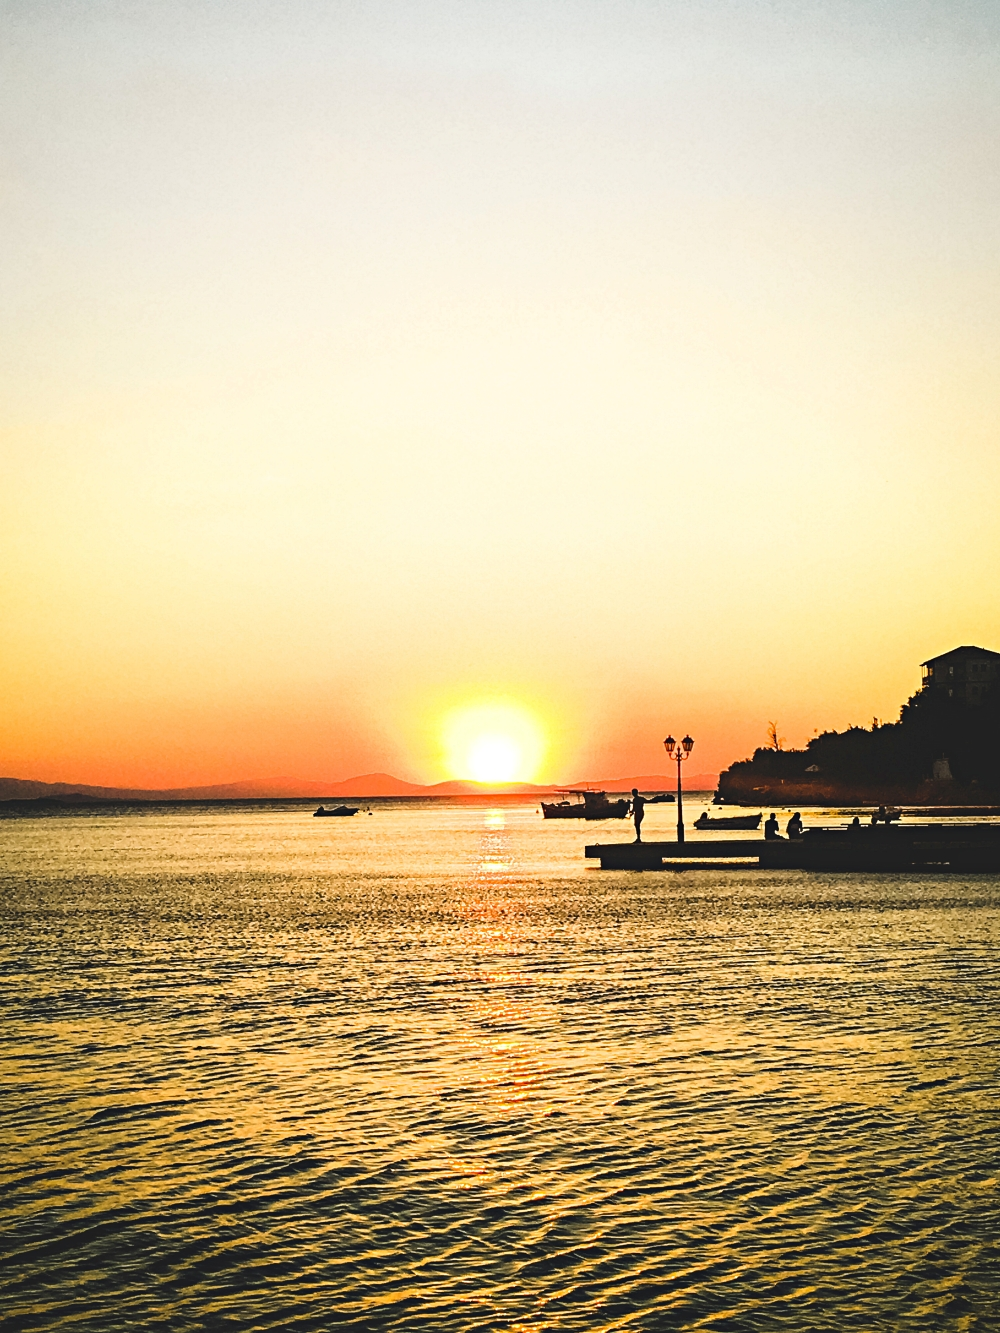 most beautiful sunset photos, zalazak sunca fotografije